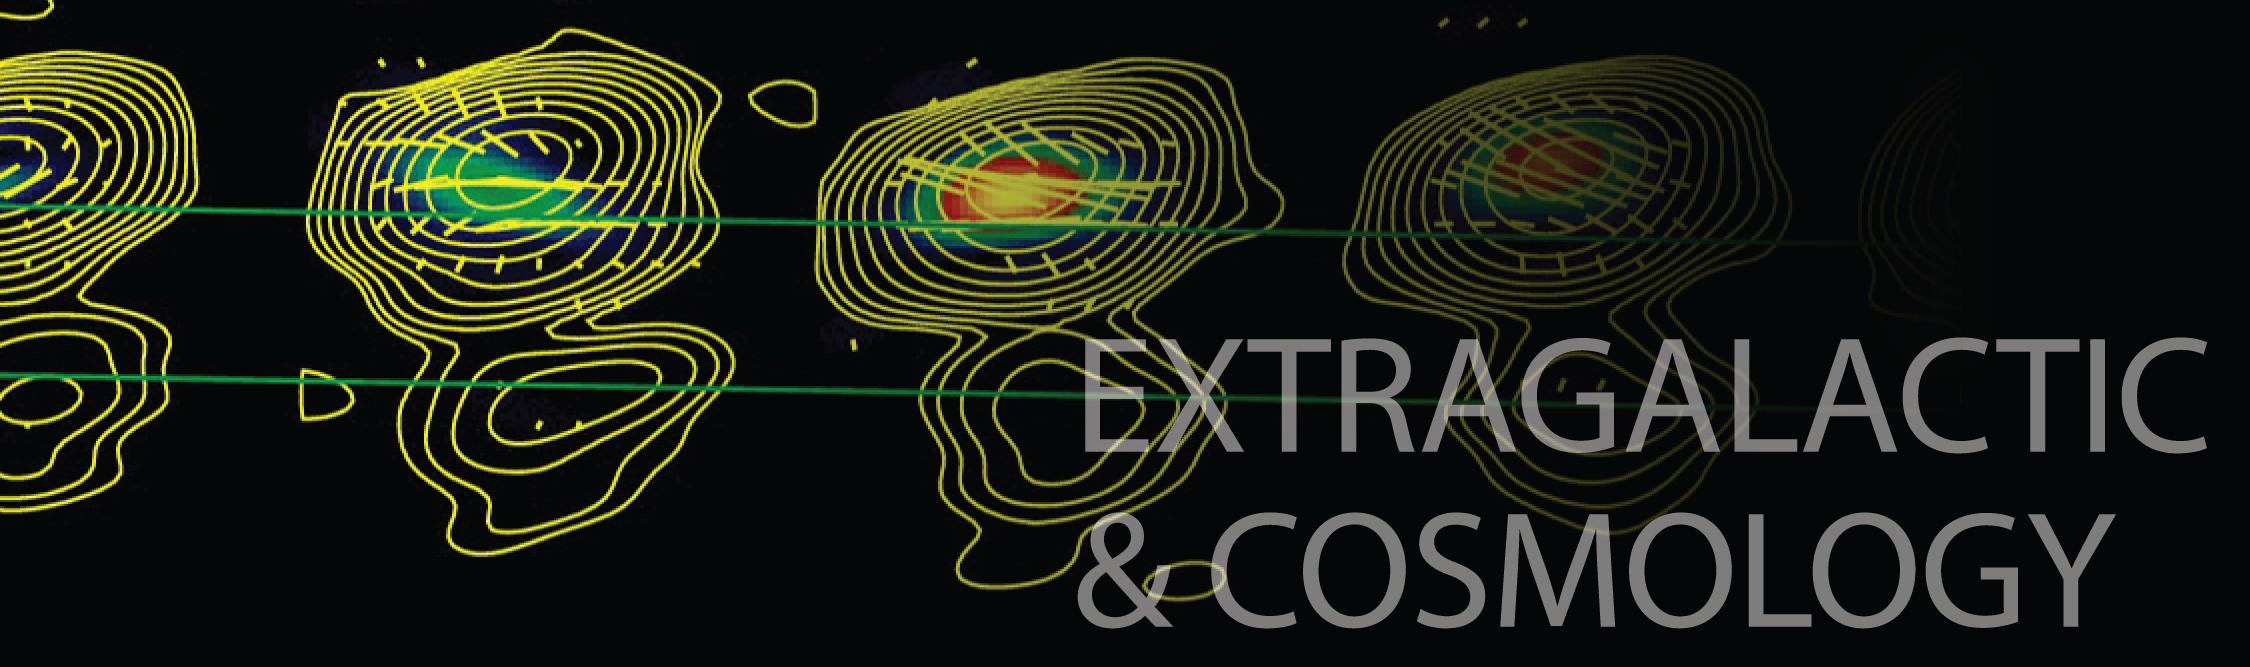 Extragalactic & Cosmology » Astronomy | Boston University